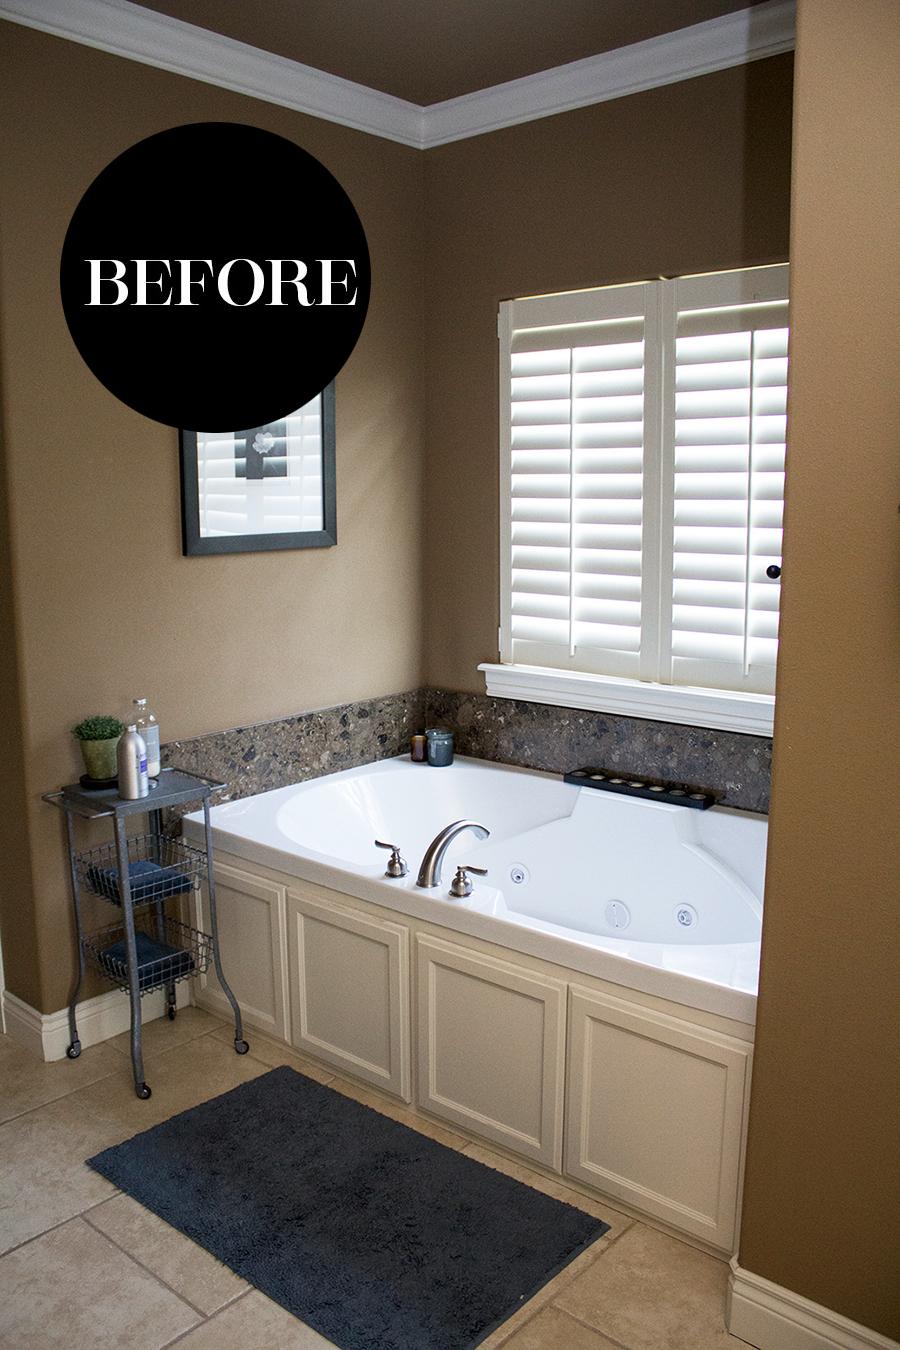 The Ultimate Bathroom Remodel